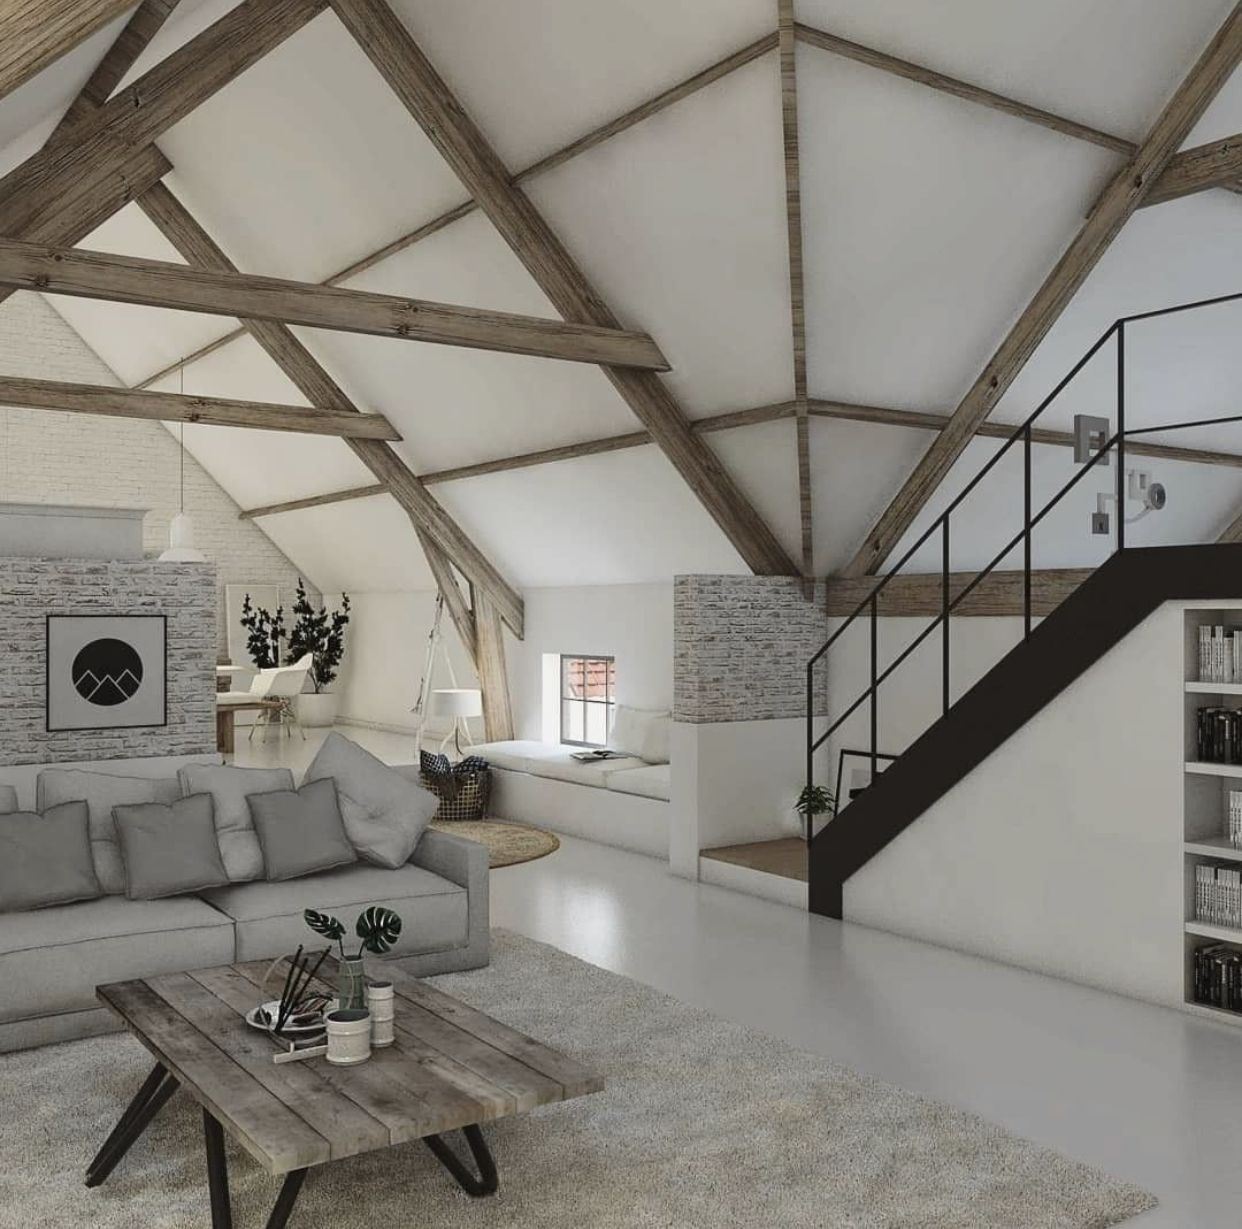 D Interiors Mała Sypialnia: Pin By Anna Tkacz On SYPIALNIA